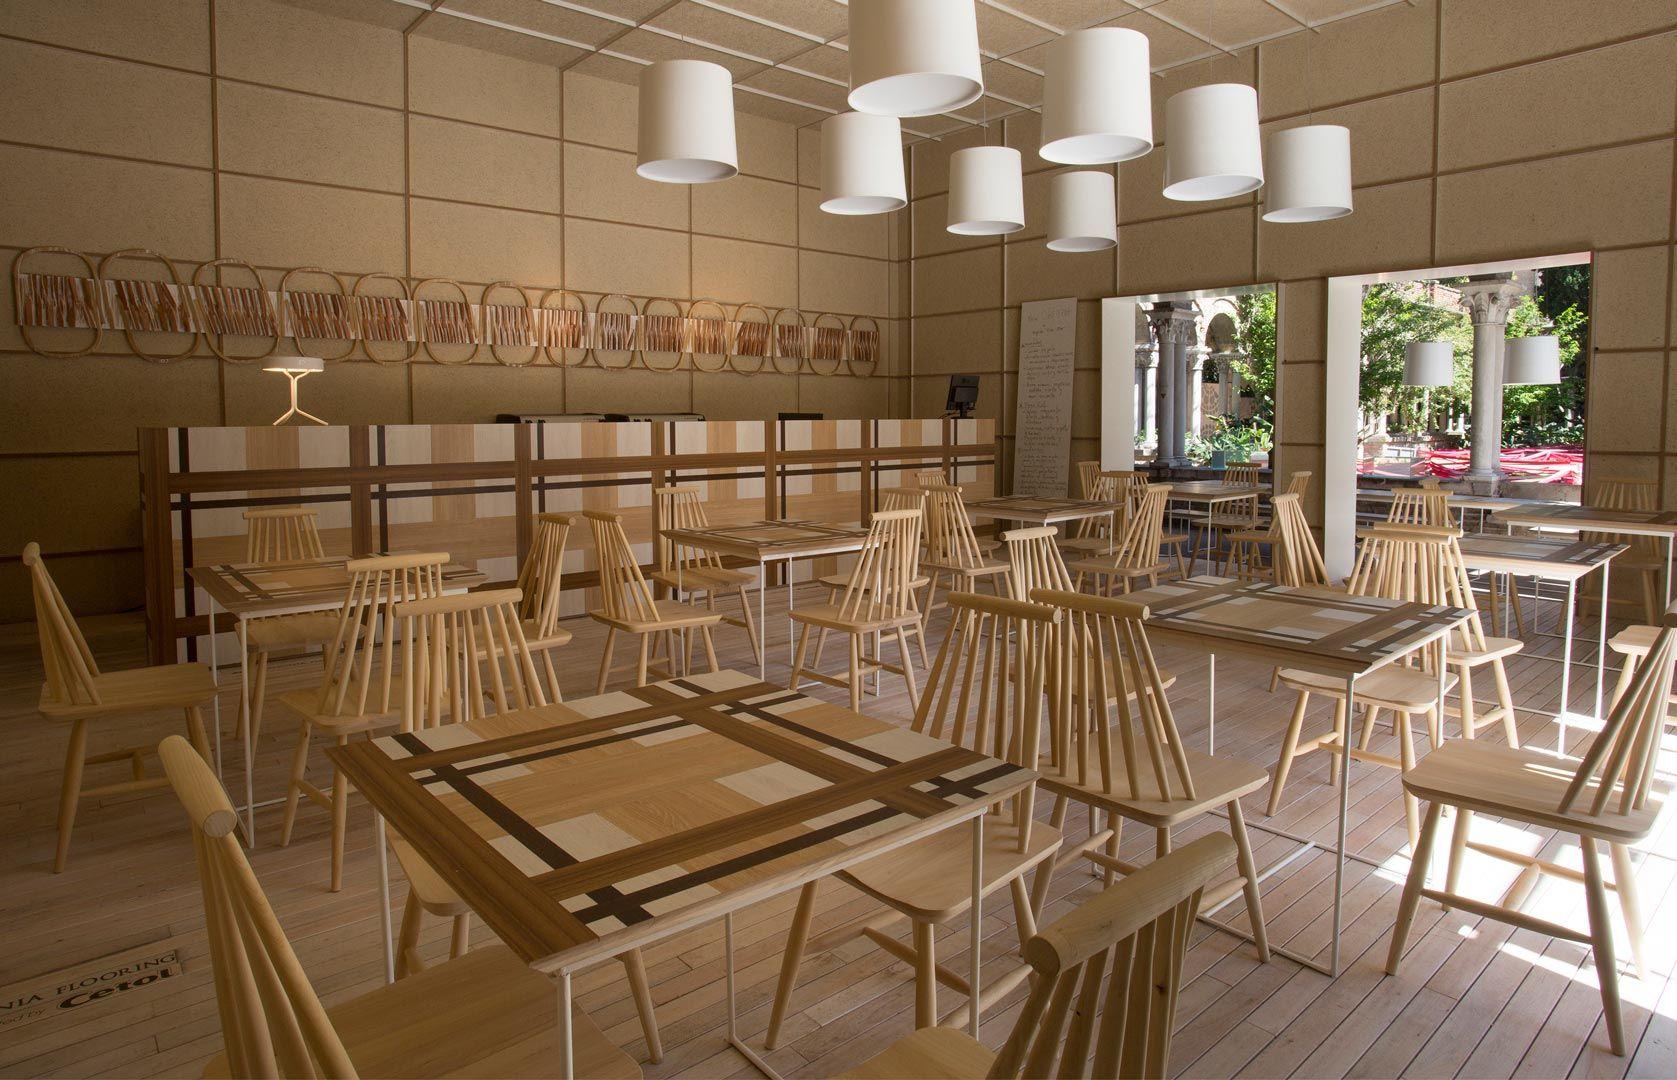 Mobiliario Wine bar Casa FOA 2014 Oropel 30 diseño estratégico